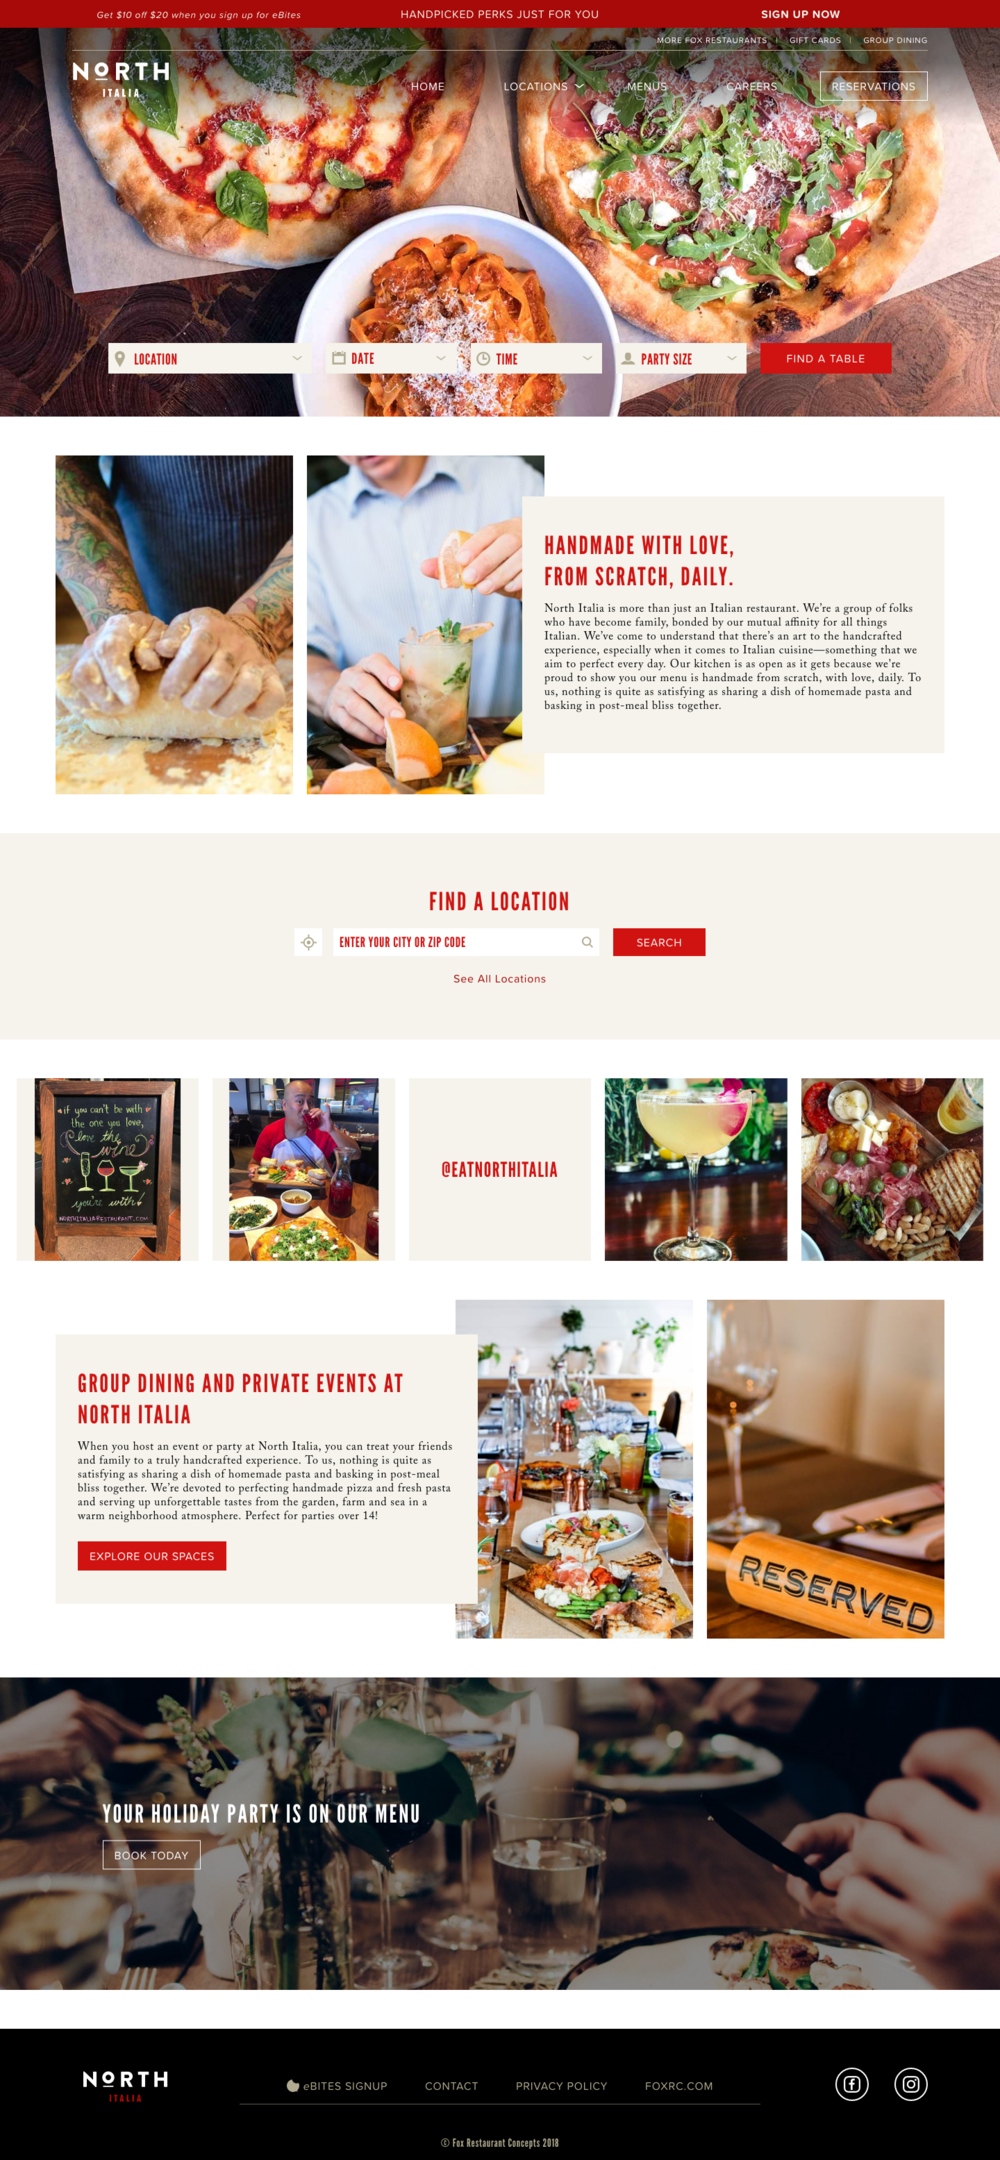 screencapture-northitaliarestaurant-2018-08-14-16_41_44.png